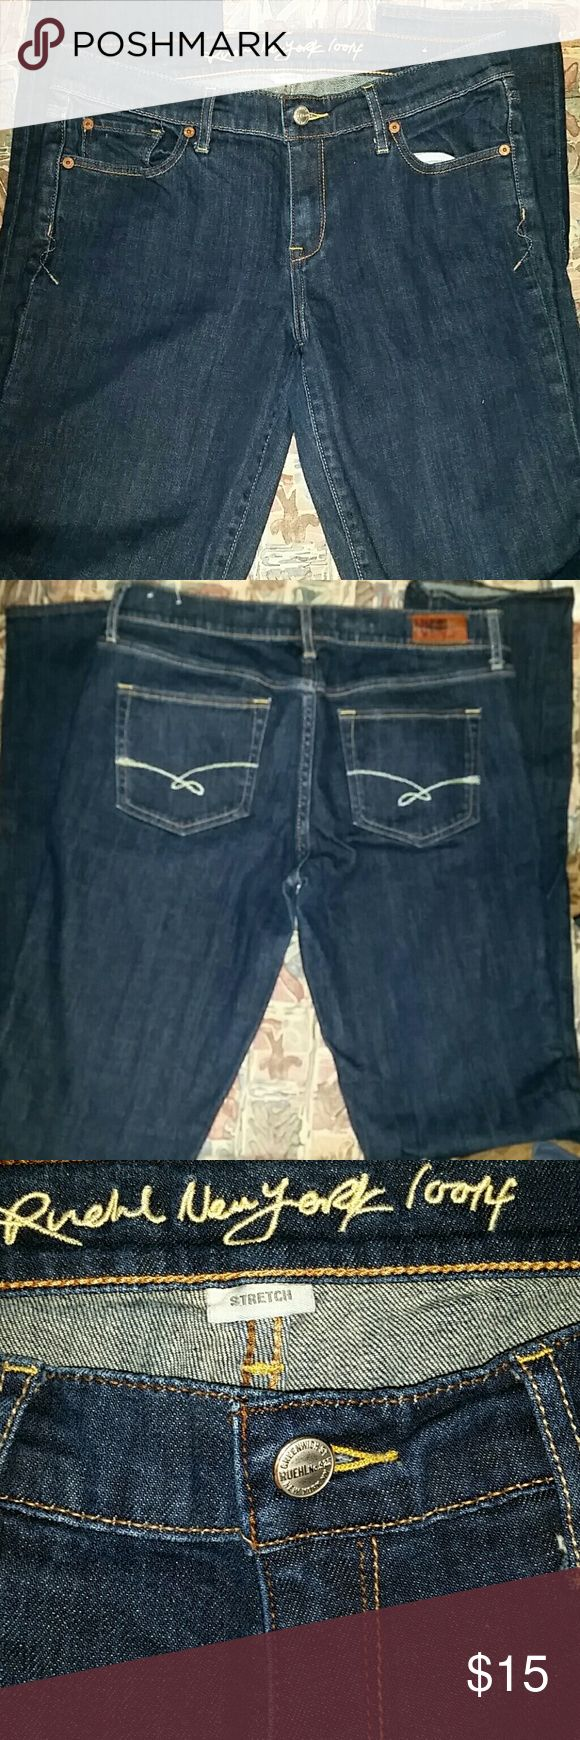 RUEHL  NEW YORK JEANS. CODE D Dark blue  Straight  leg jeans inseam 35 CODE D 2 for $20  or 1 for  $15 Ruehl No. 925 Jeans Straight Leg